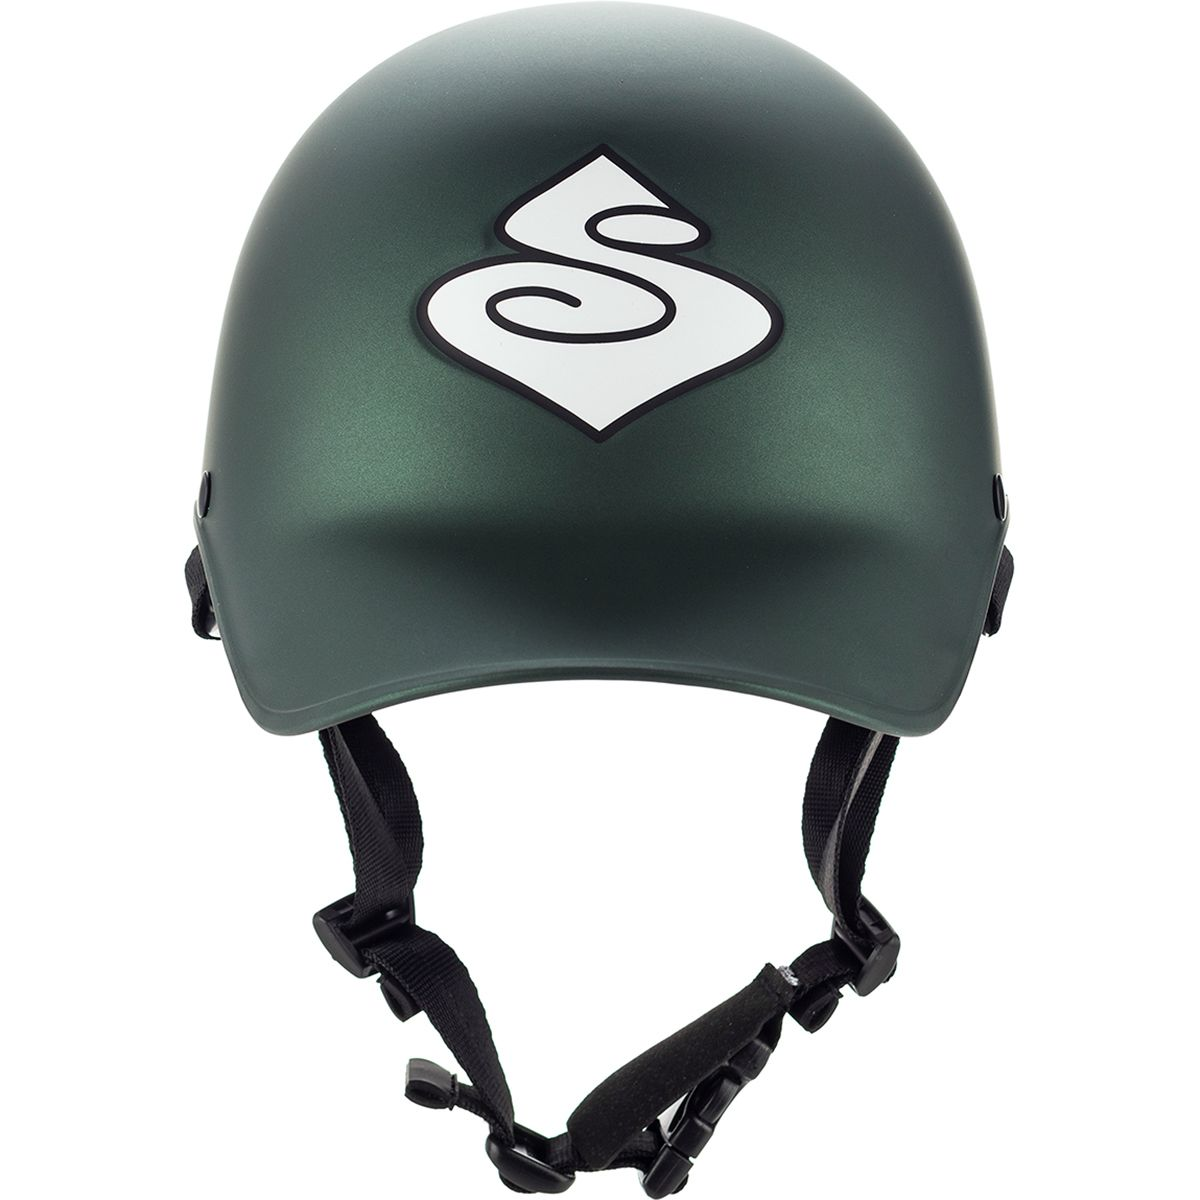 Sweet Protection Strutter Helmet Matte Racing Green Metallic, L/XL SET002E-MARAGNME-LXL